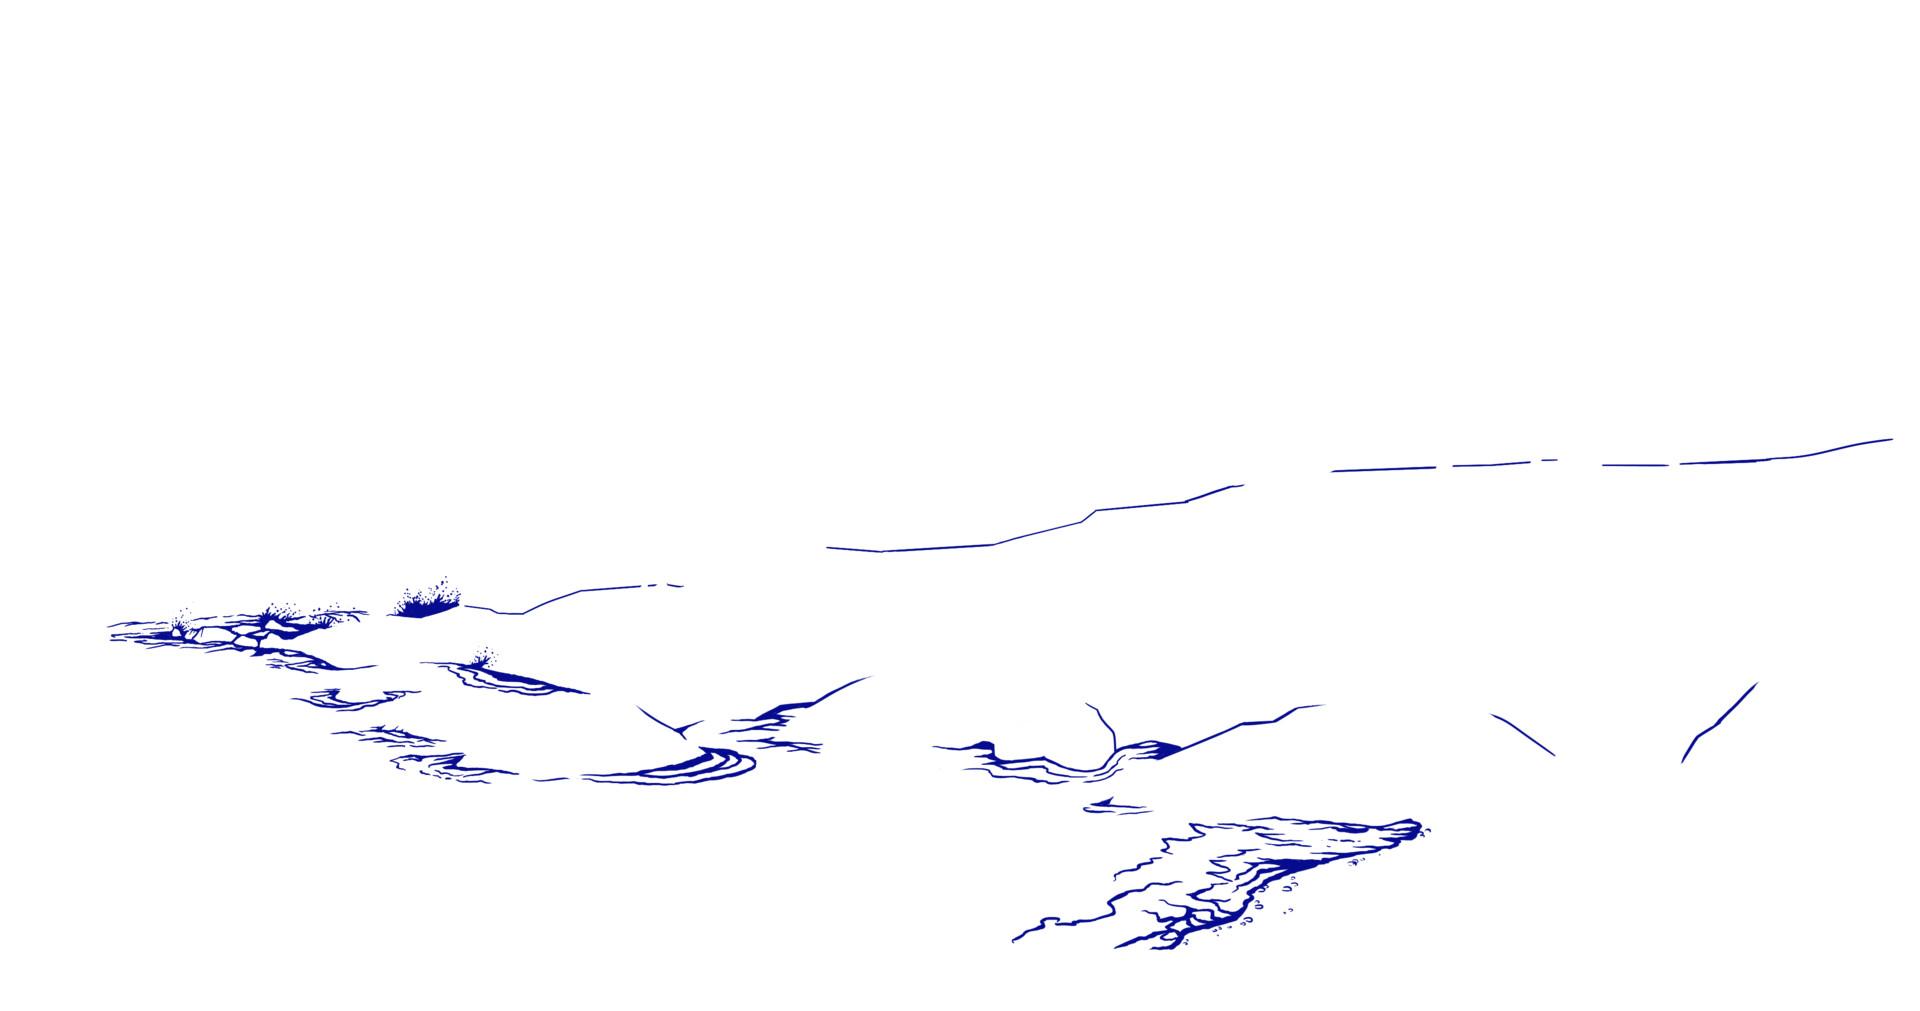 Lance laspina leocarrillowhitewater 01